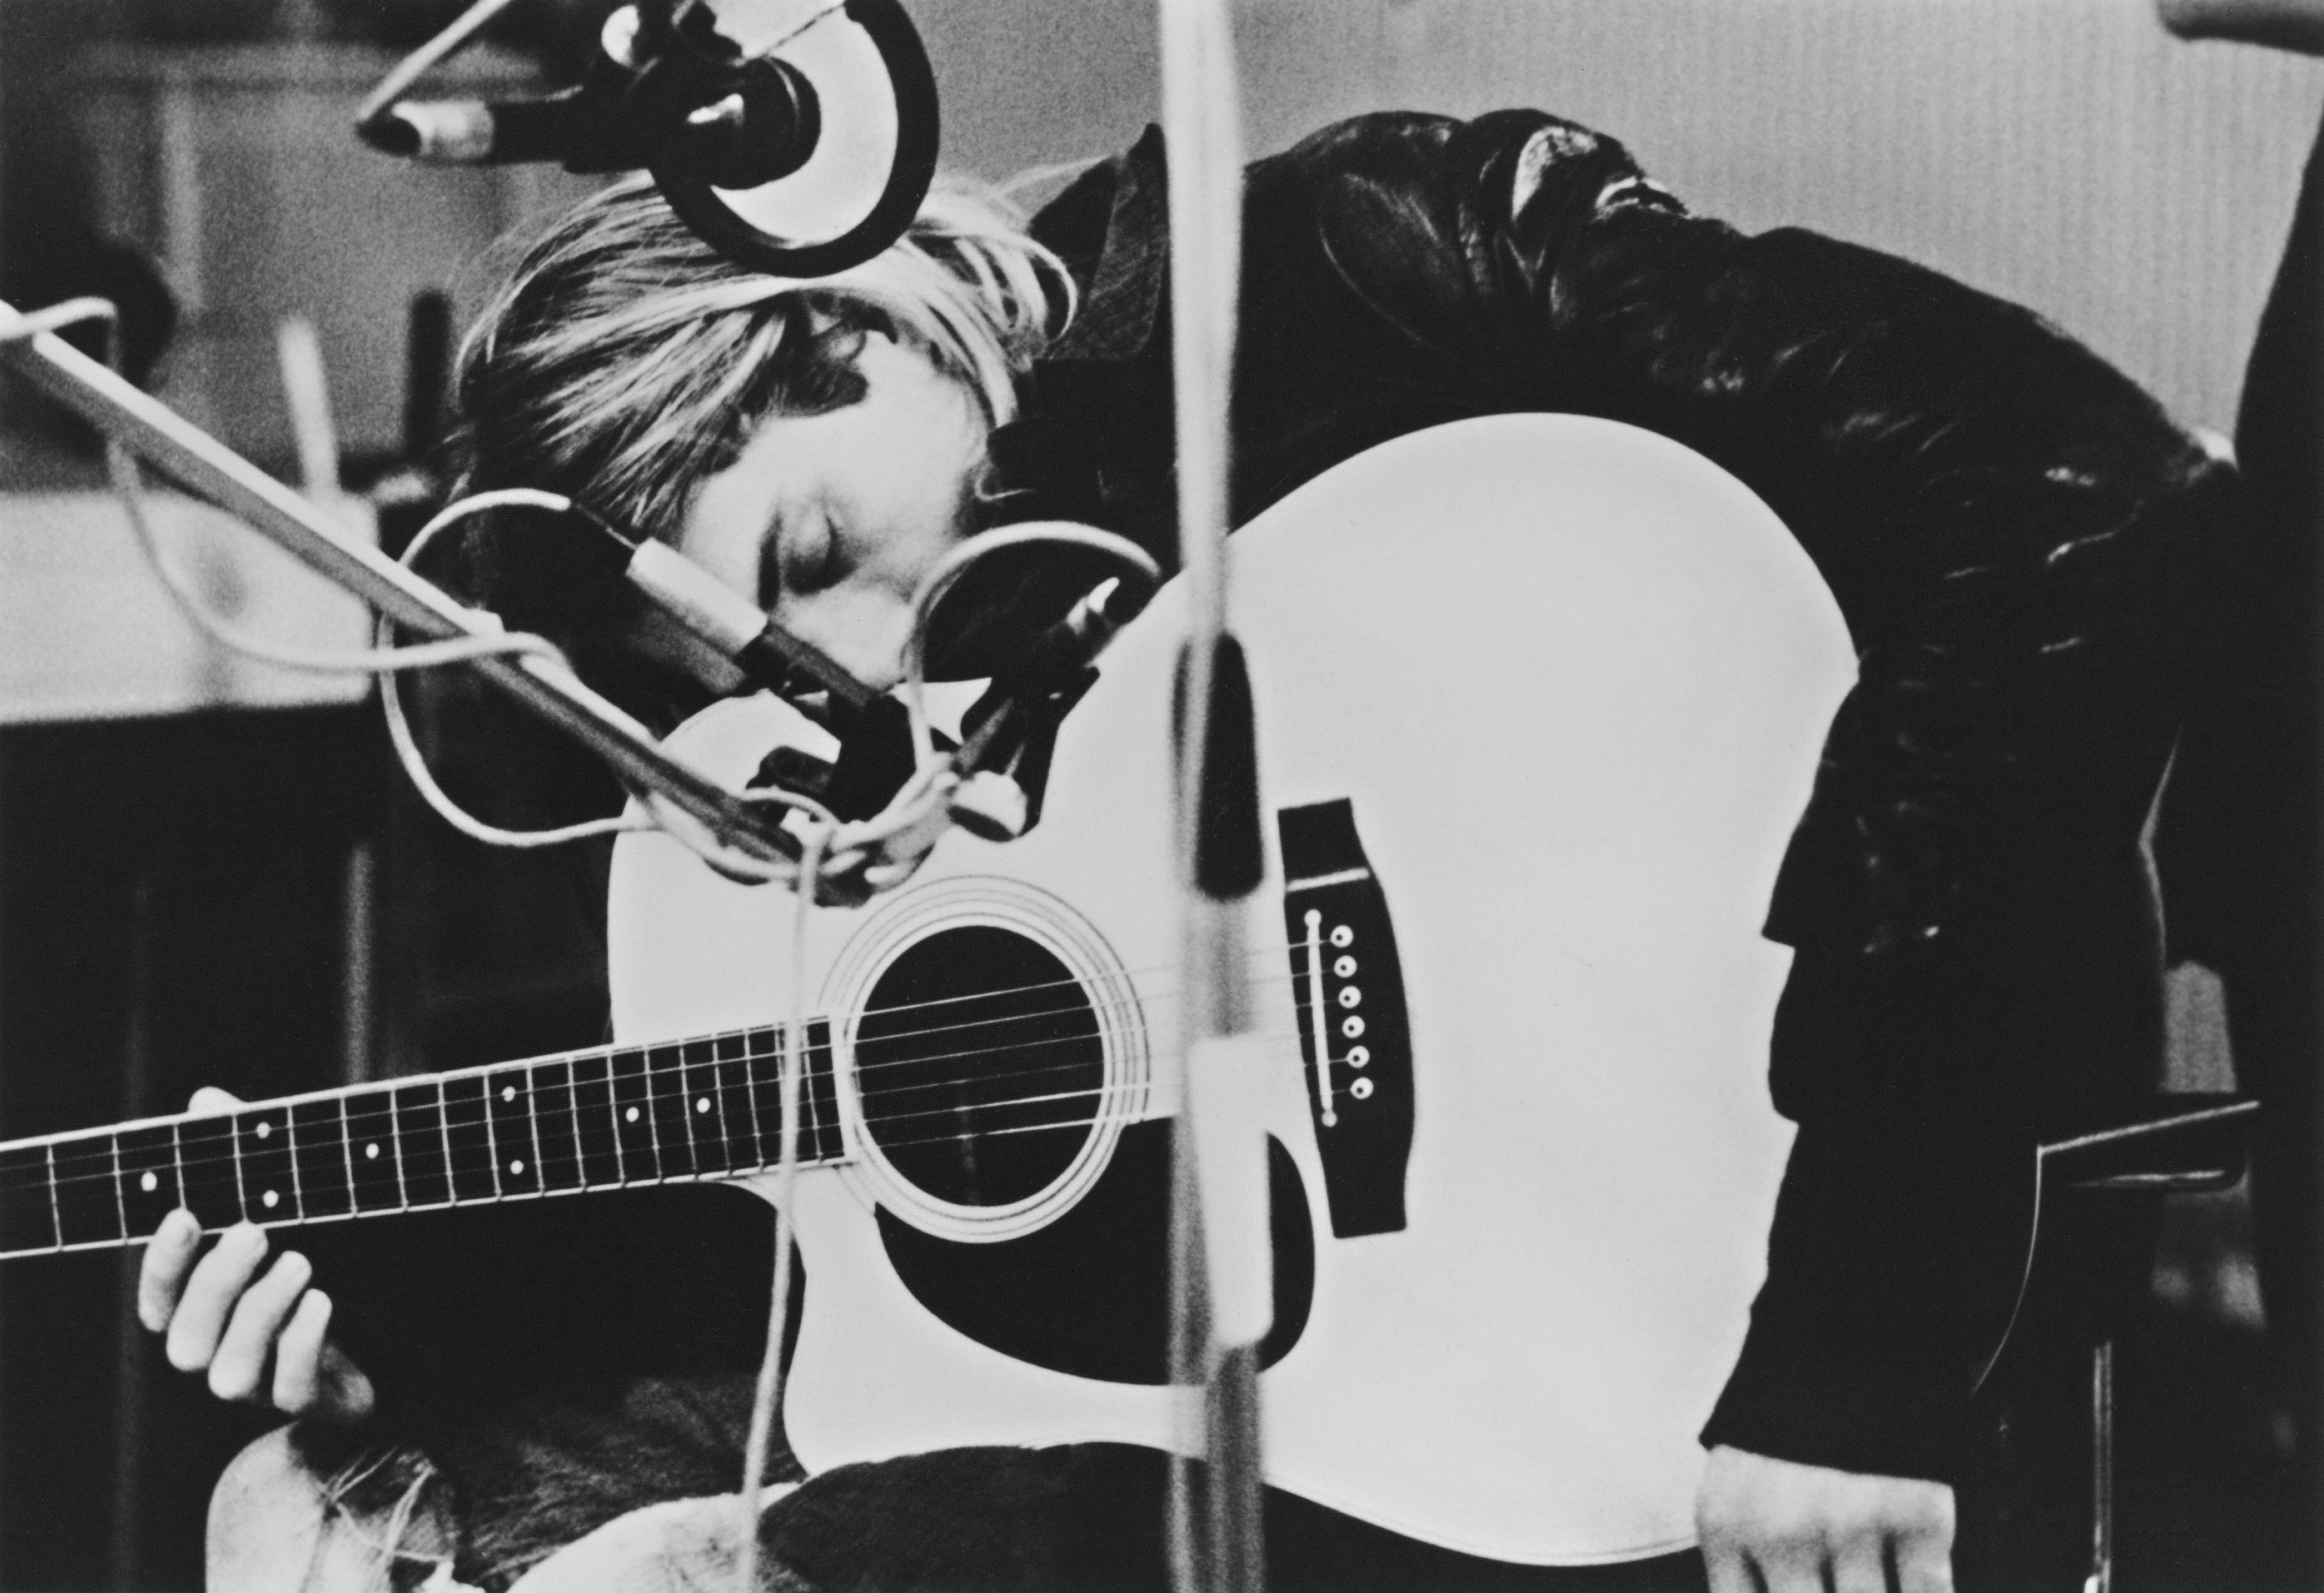 Singer-songwriter and guitarist Kurt Cobain (1967 - 1994), of American grunge band Nirvana, playing a Takamine acoustic guita